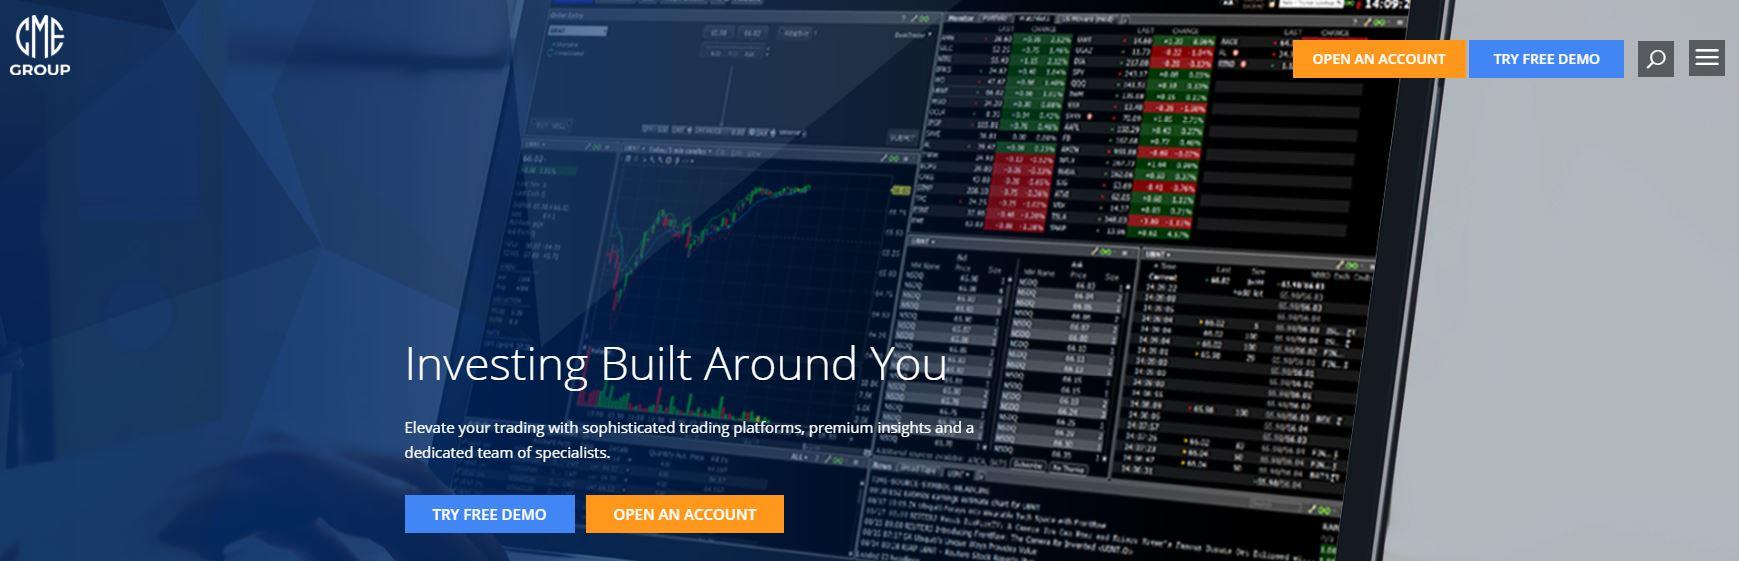 Capital Markets Elite Group